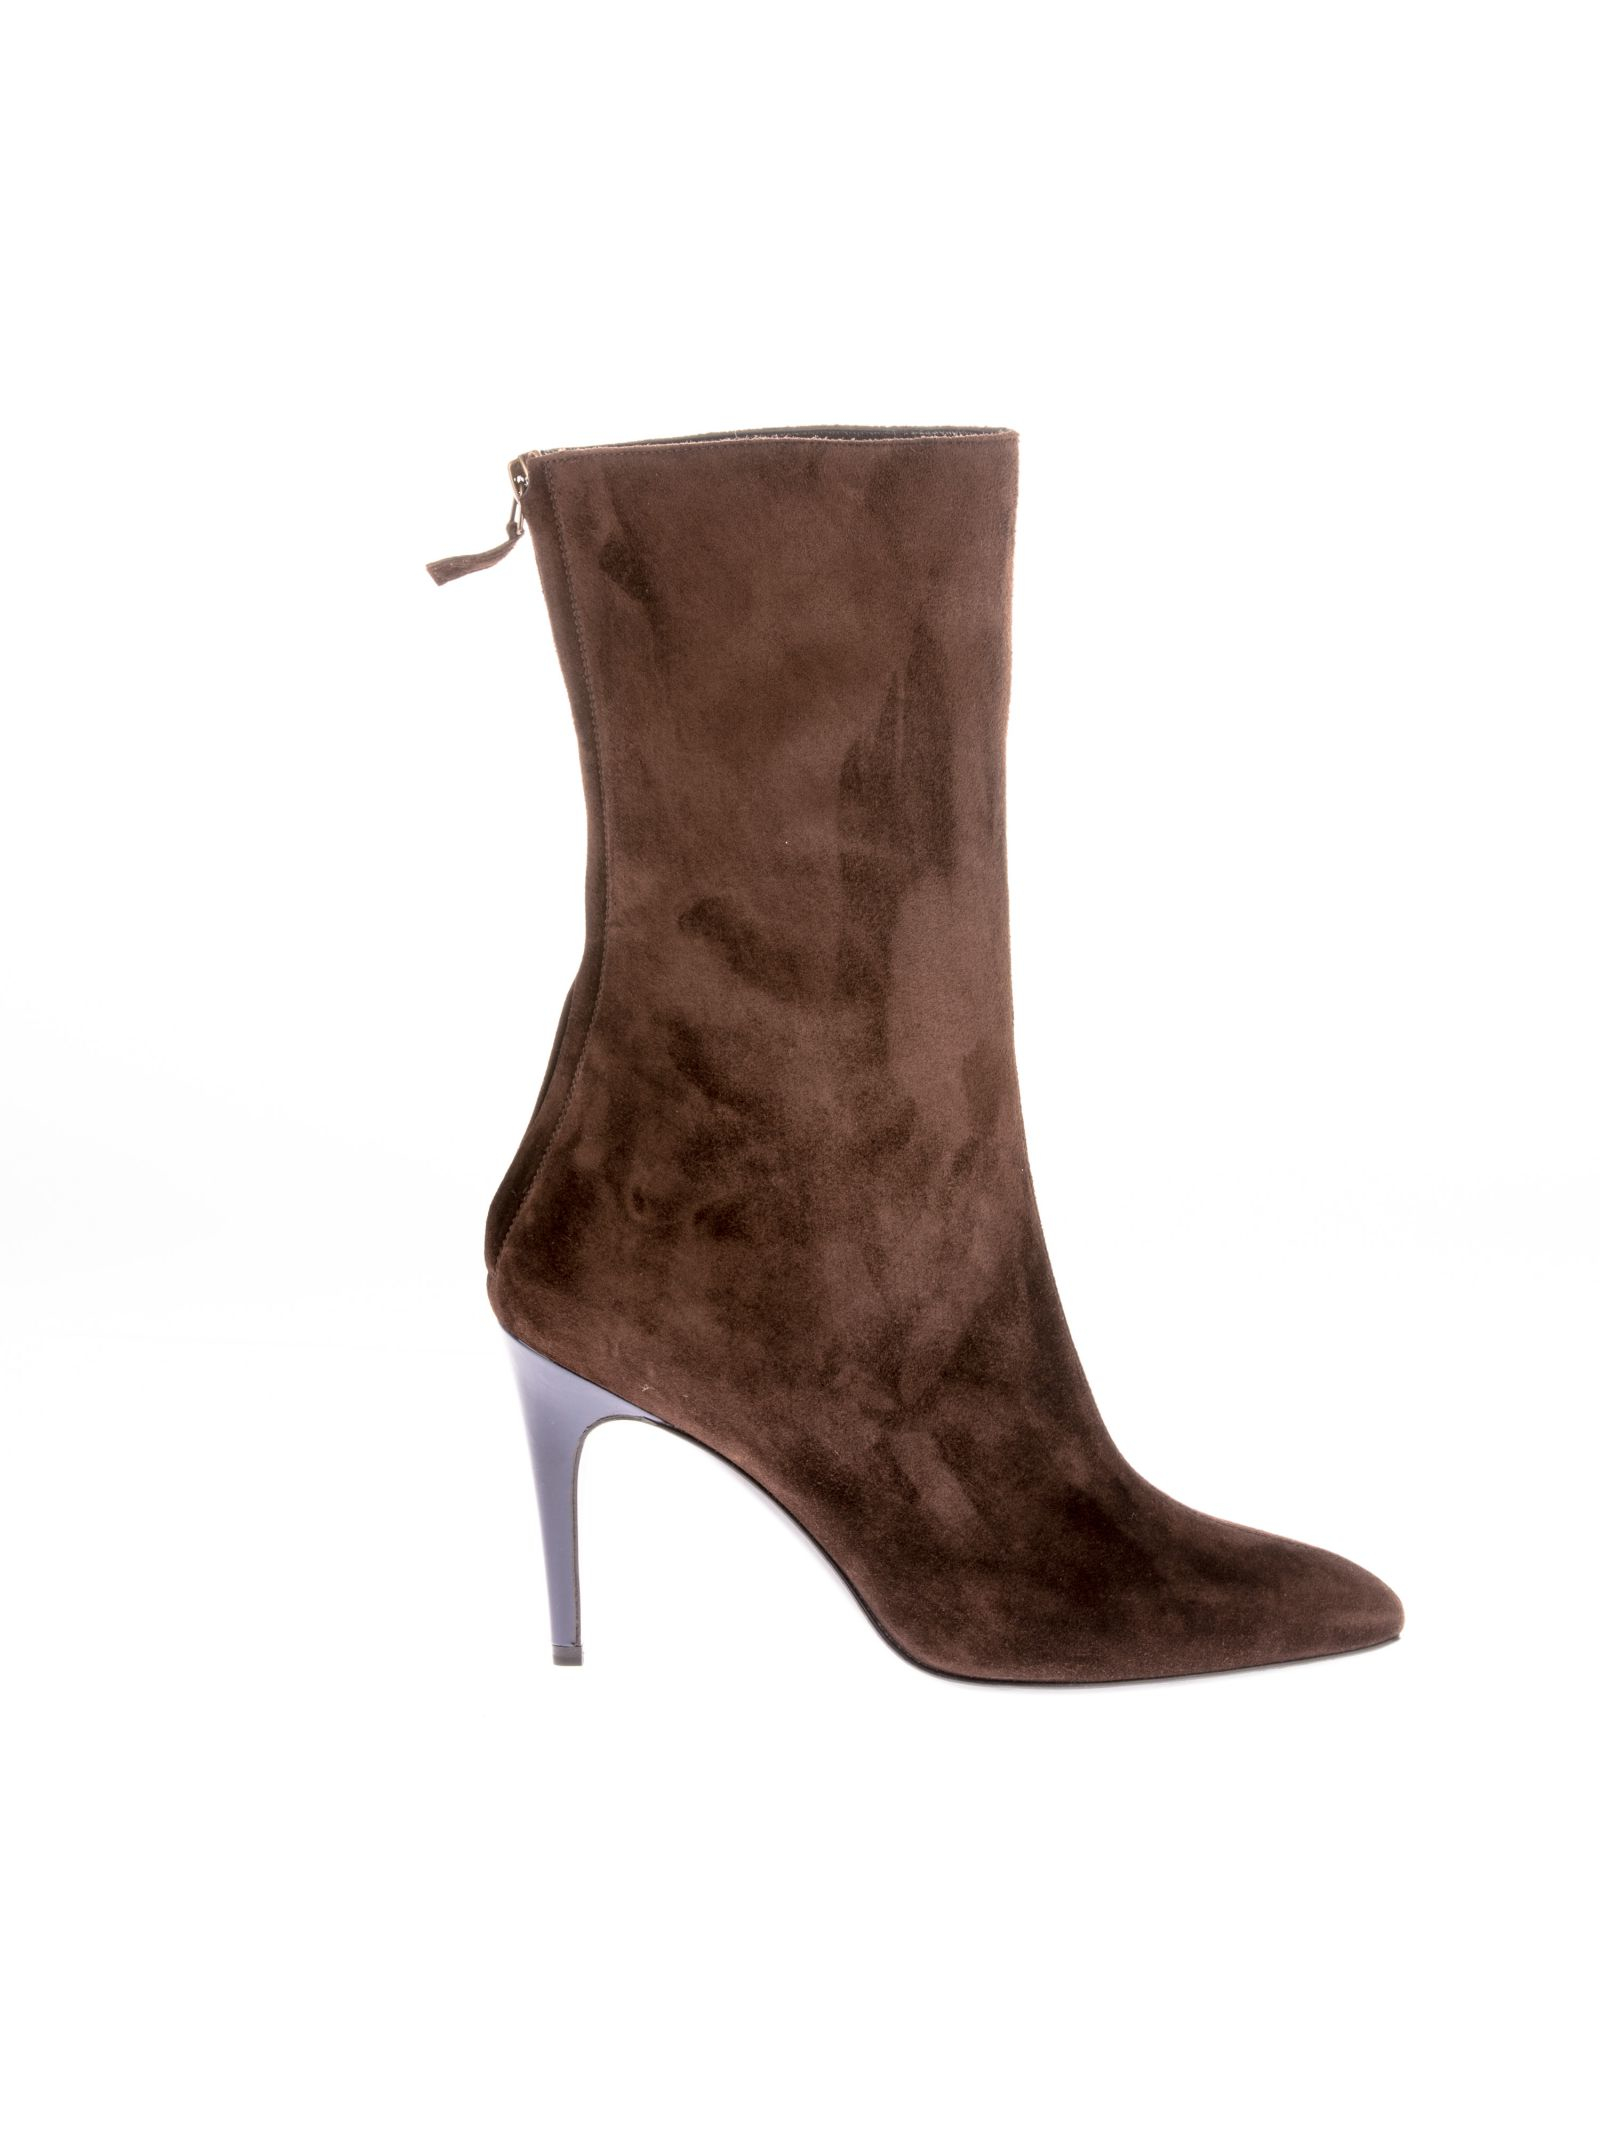 michel vivien brown suede ankle boots in multicolor